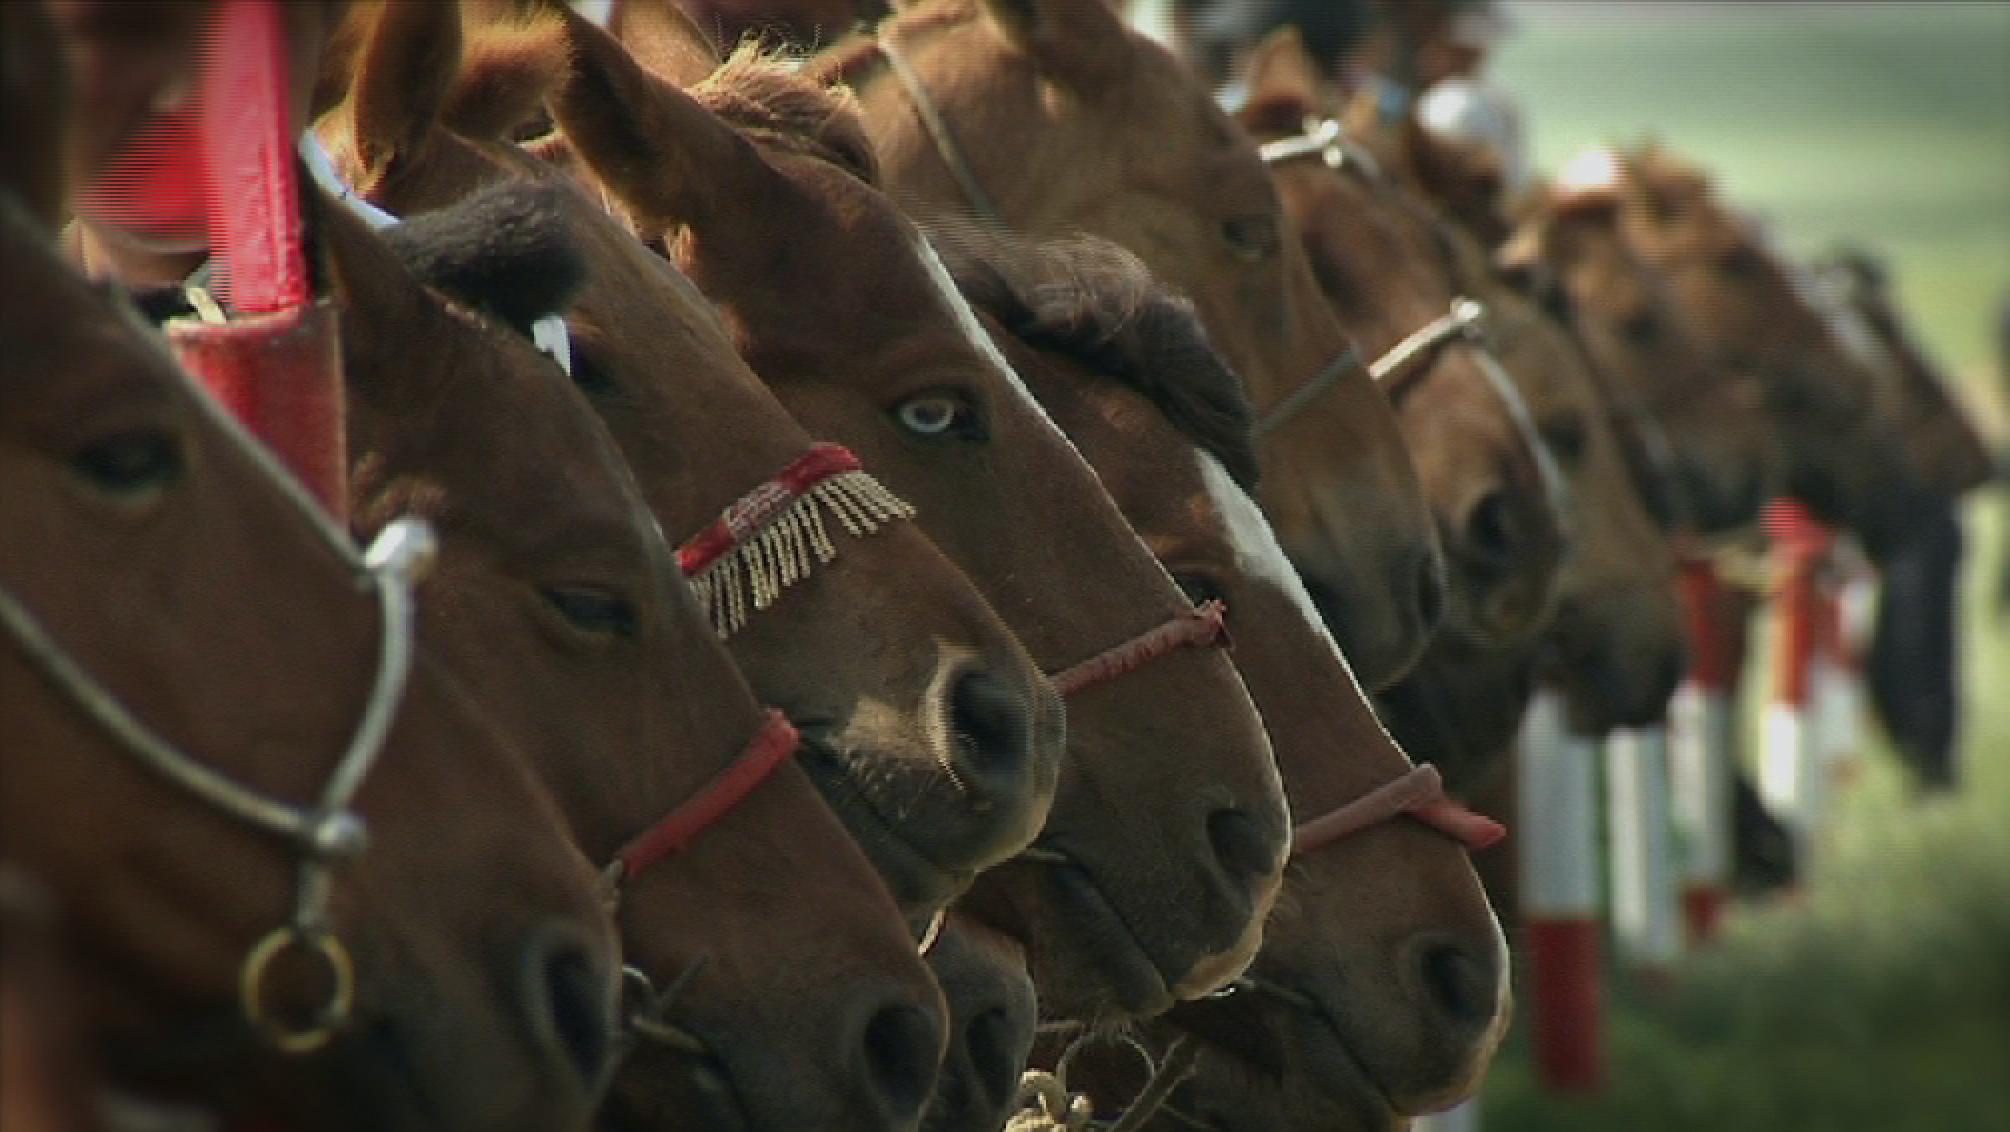 Mongolians Celebrate Muscular Past